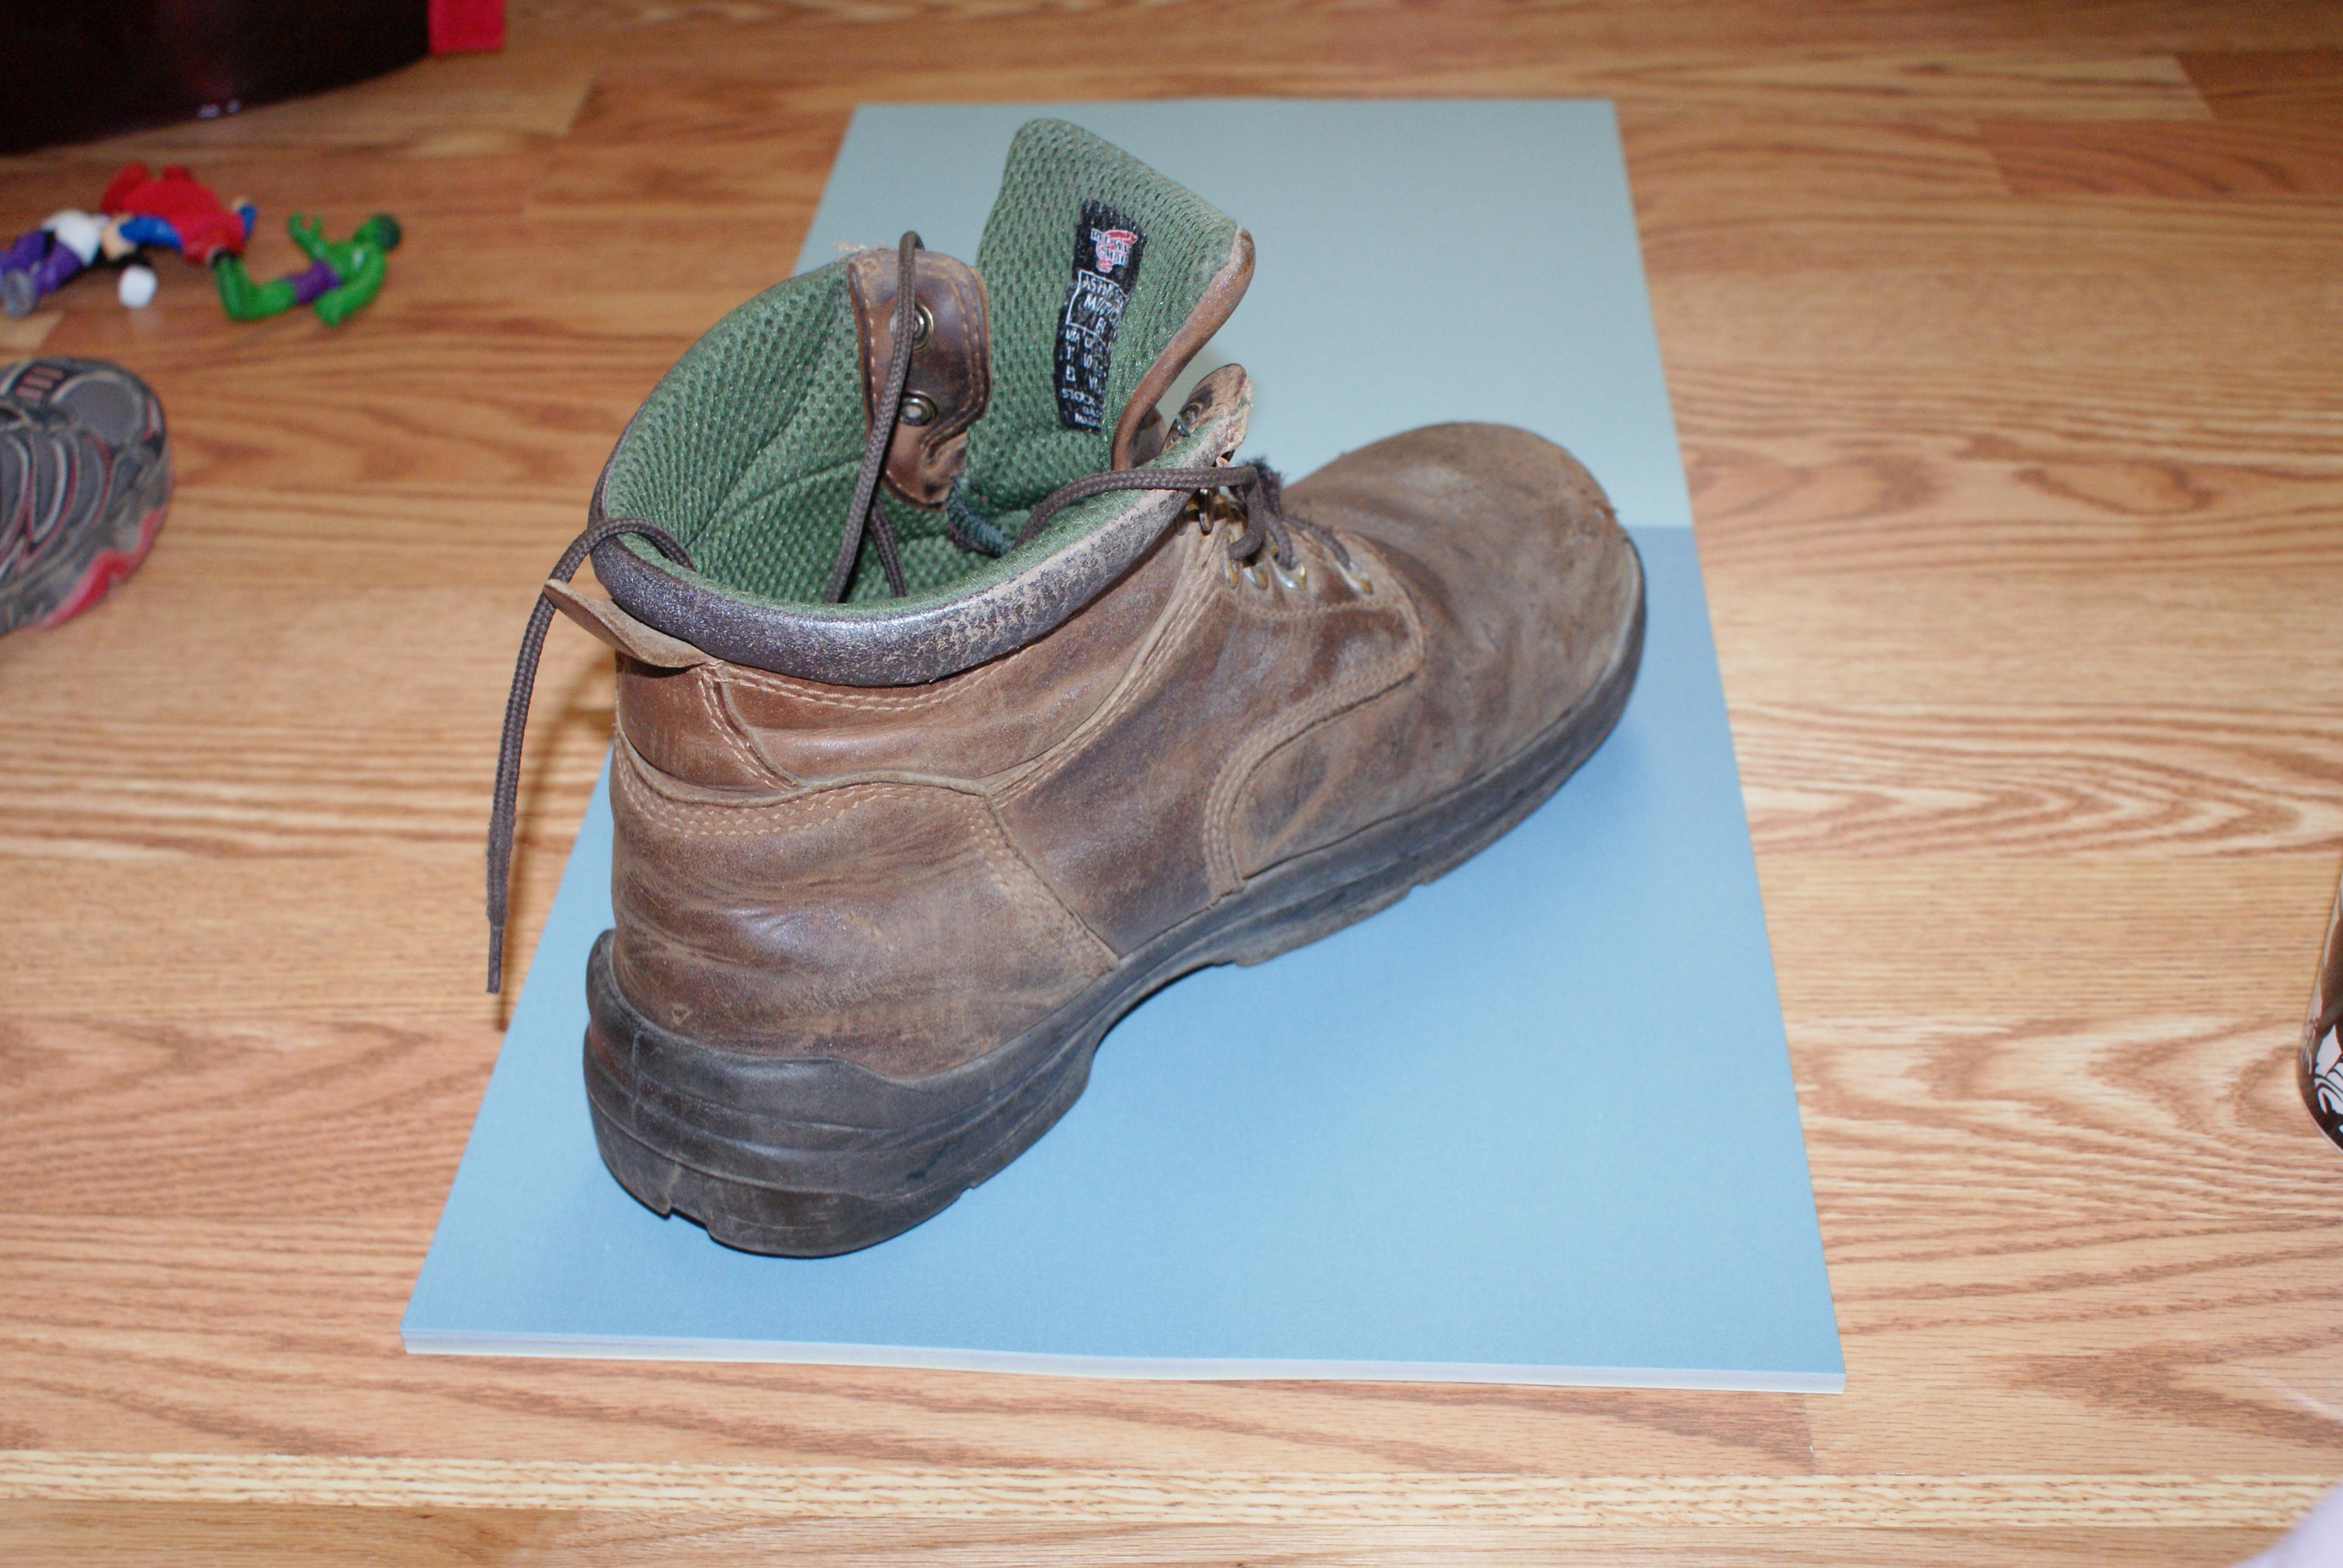 Following In Daddy's Footprints